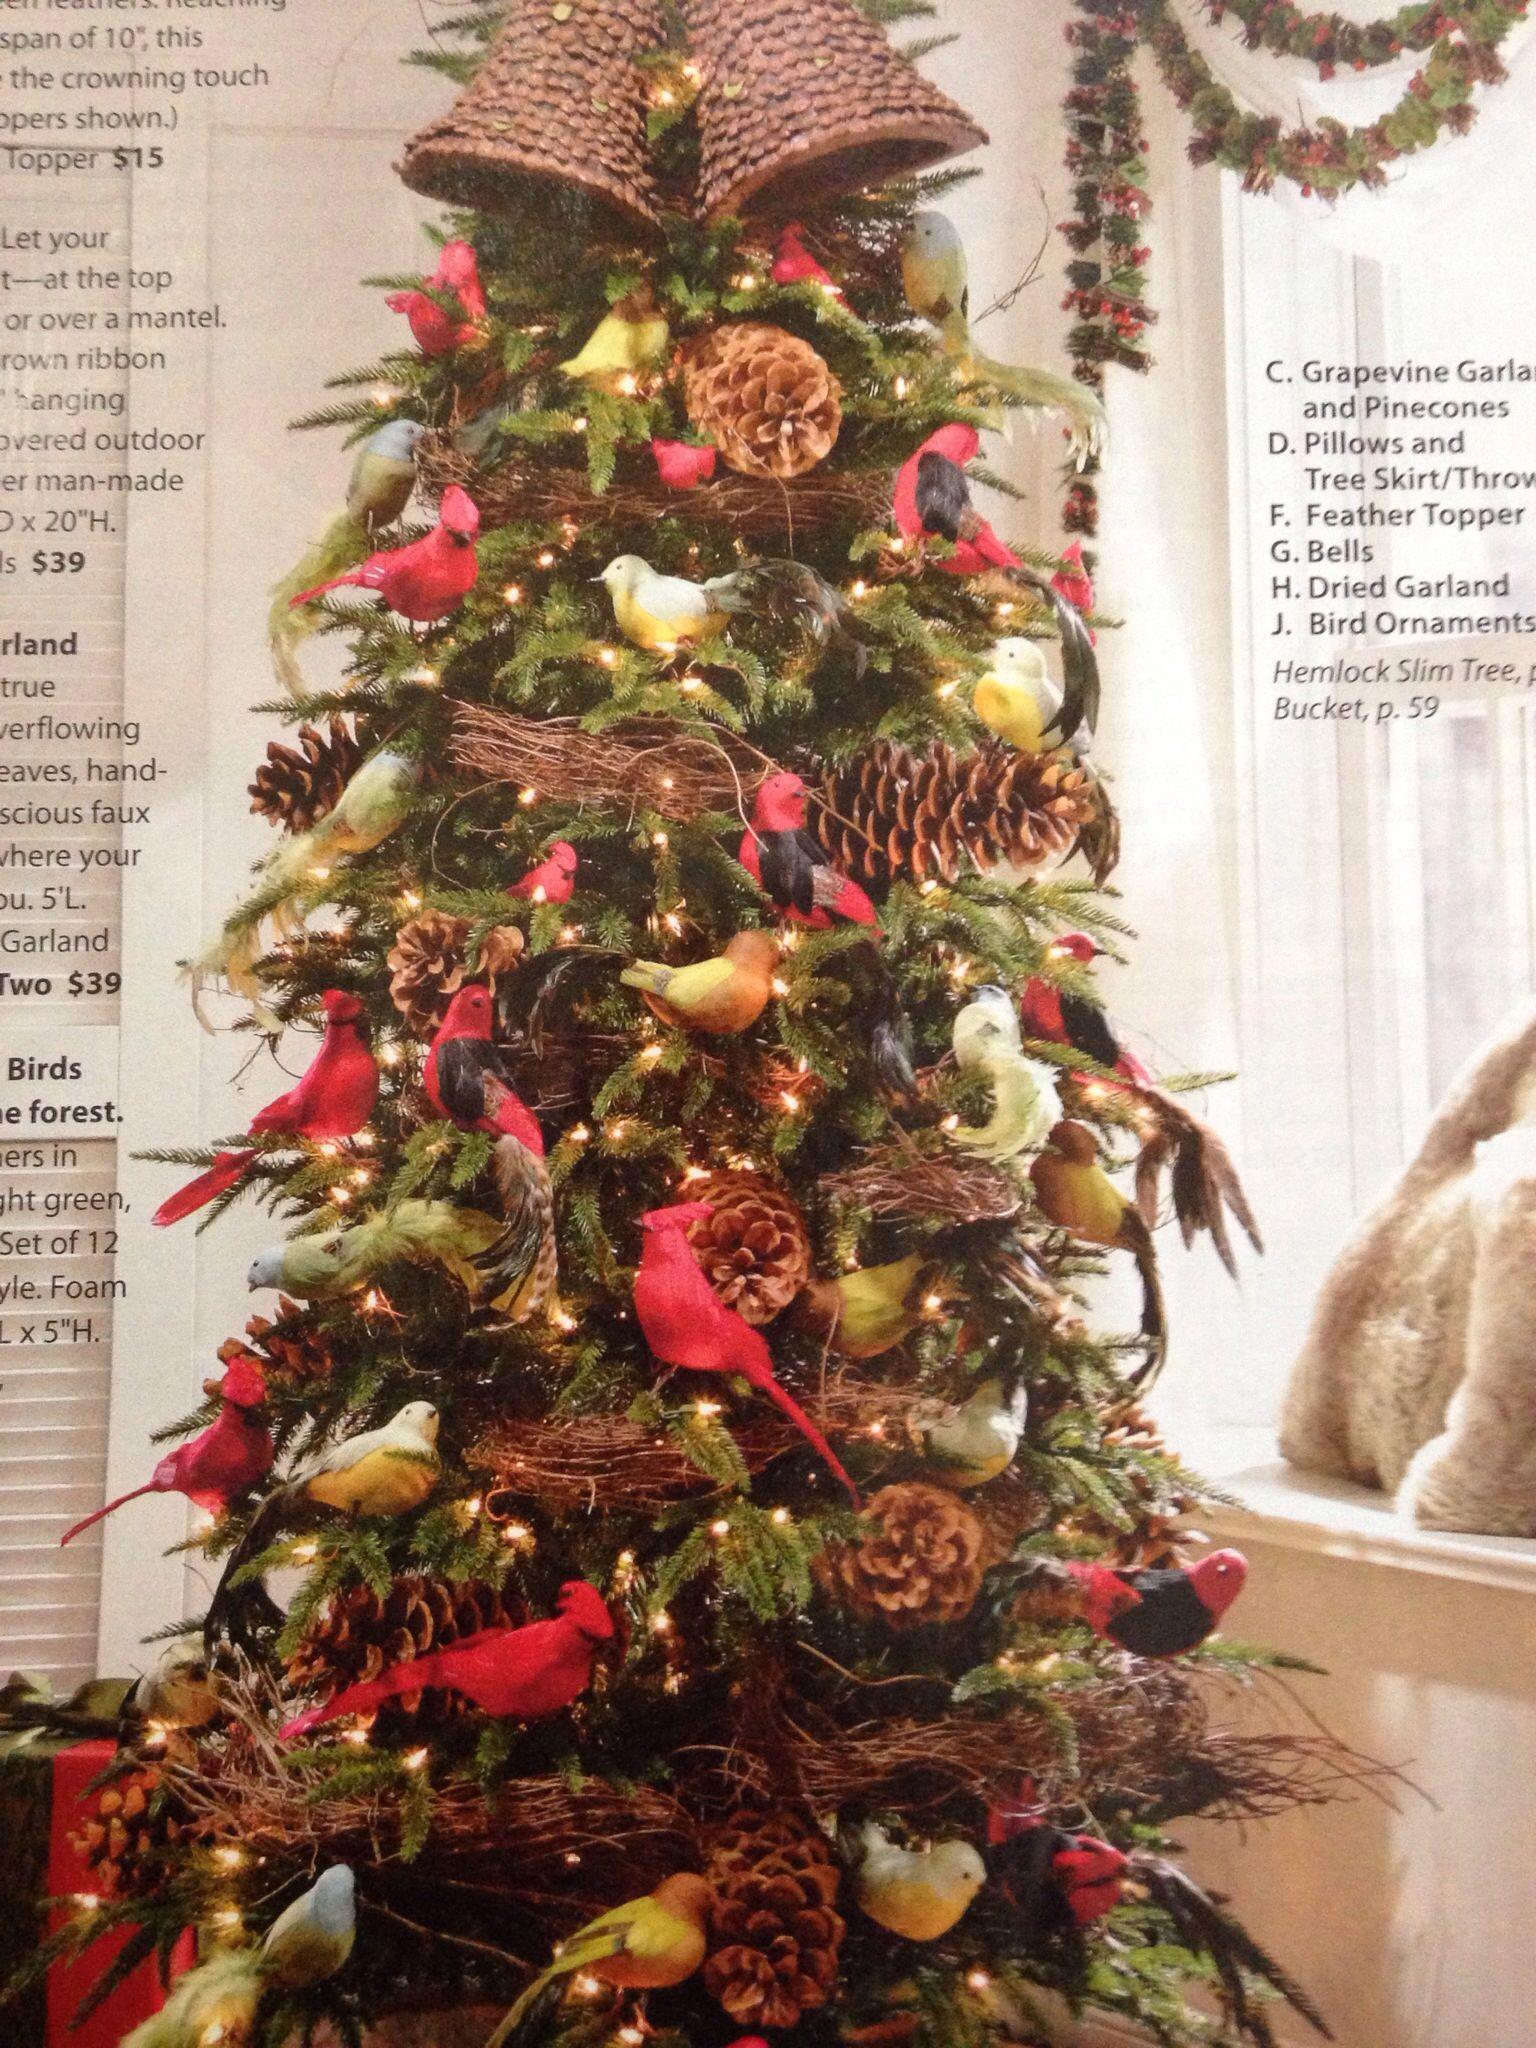 Red birds Christmas tree | Tree decorations year round | Pinterest